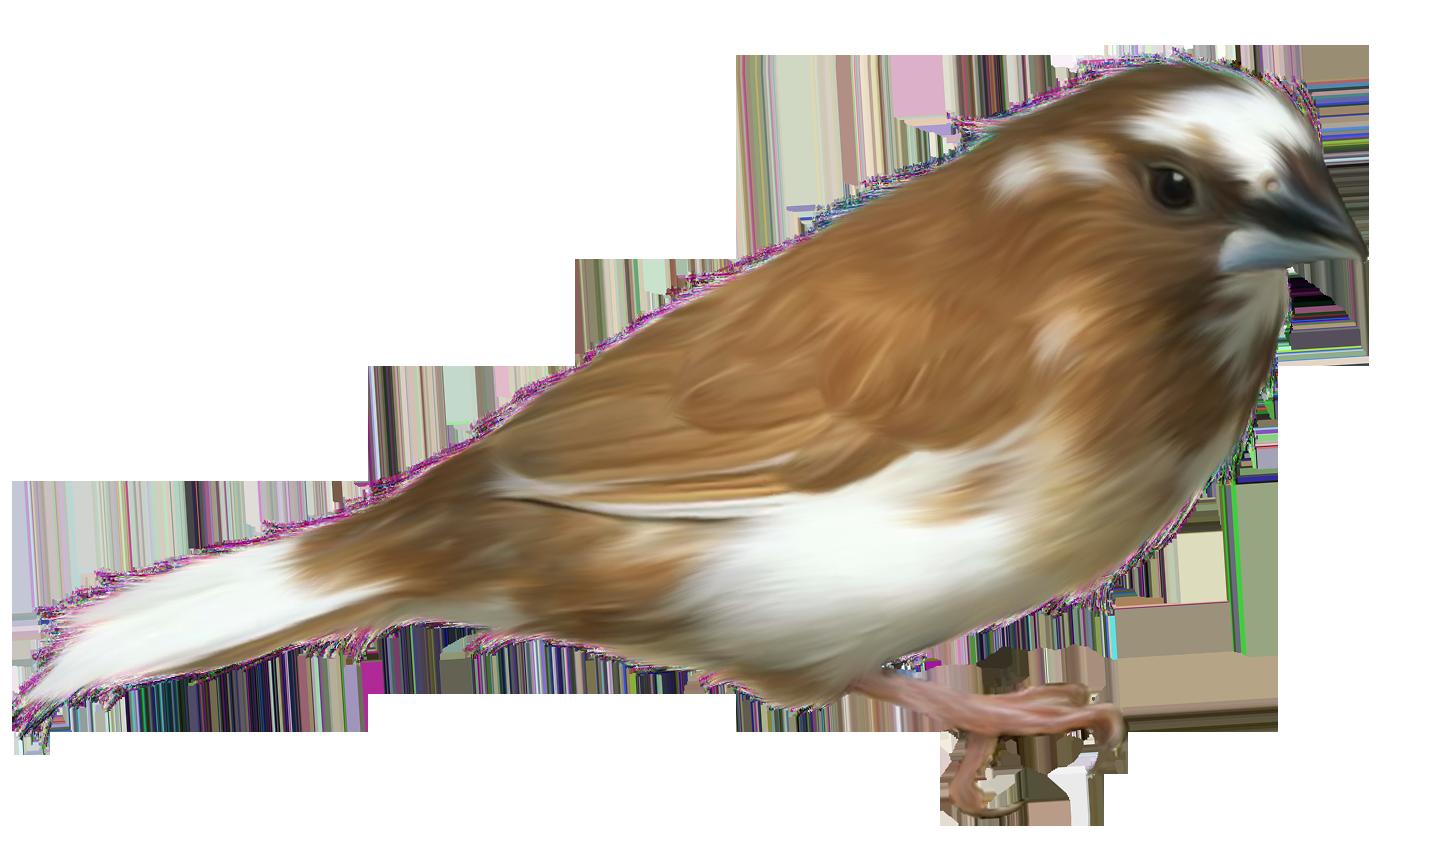 Small bird transparent png. Clipart birds brown